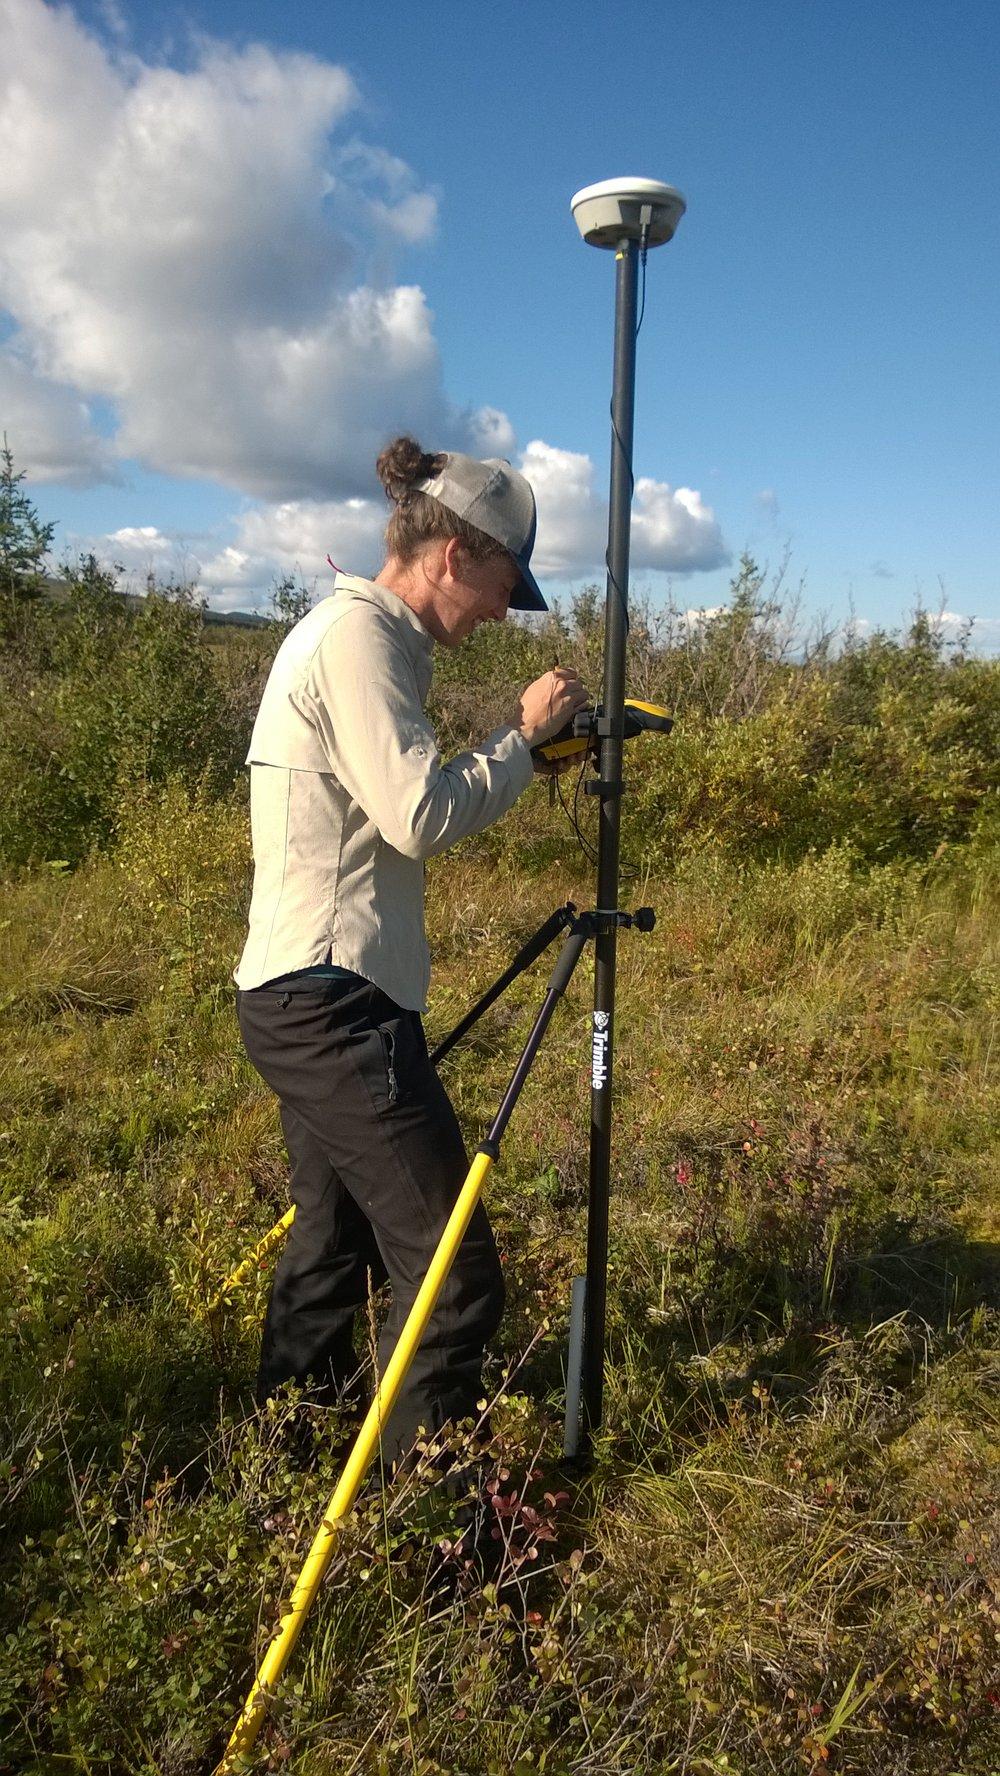 Katrine Gorham working at the NEON Alaska Healy site measuring study plots using survey equipment. Photo: NEON Alaska